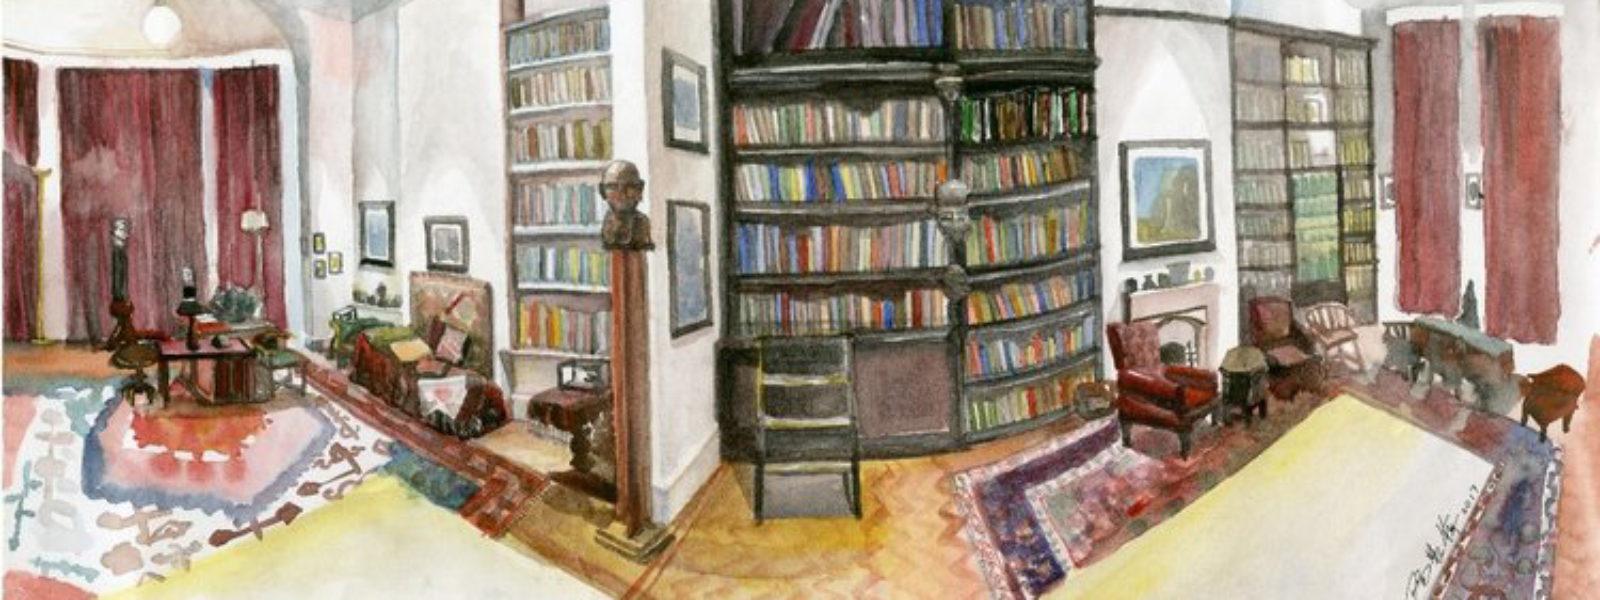 Freud's Study, Huiping Yang, 2017